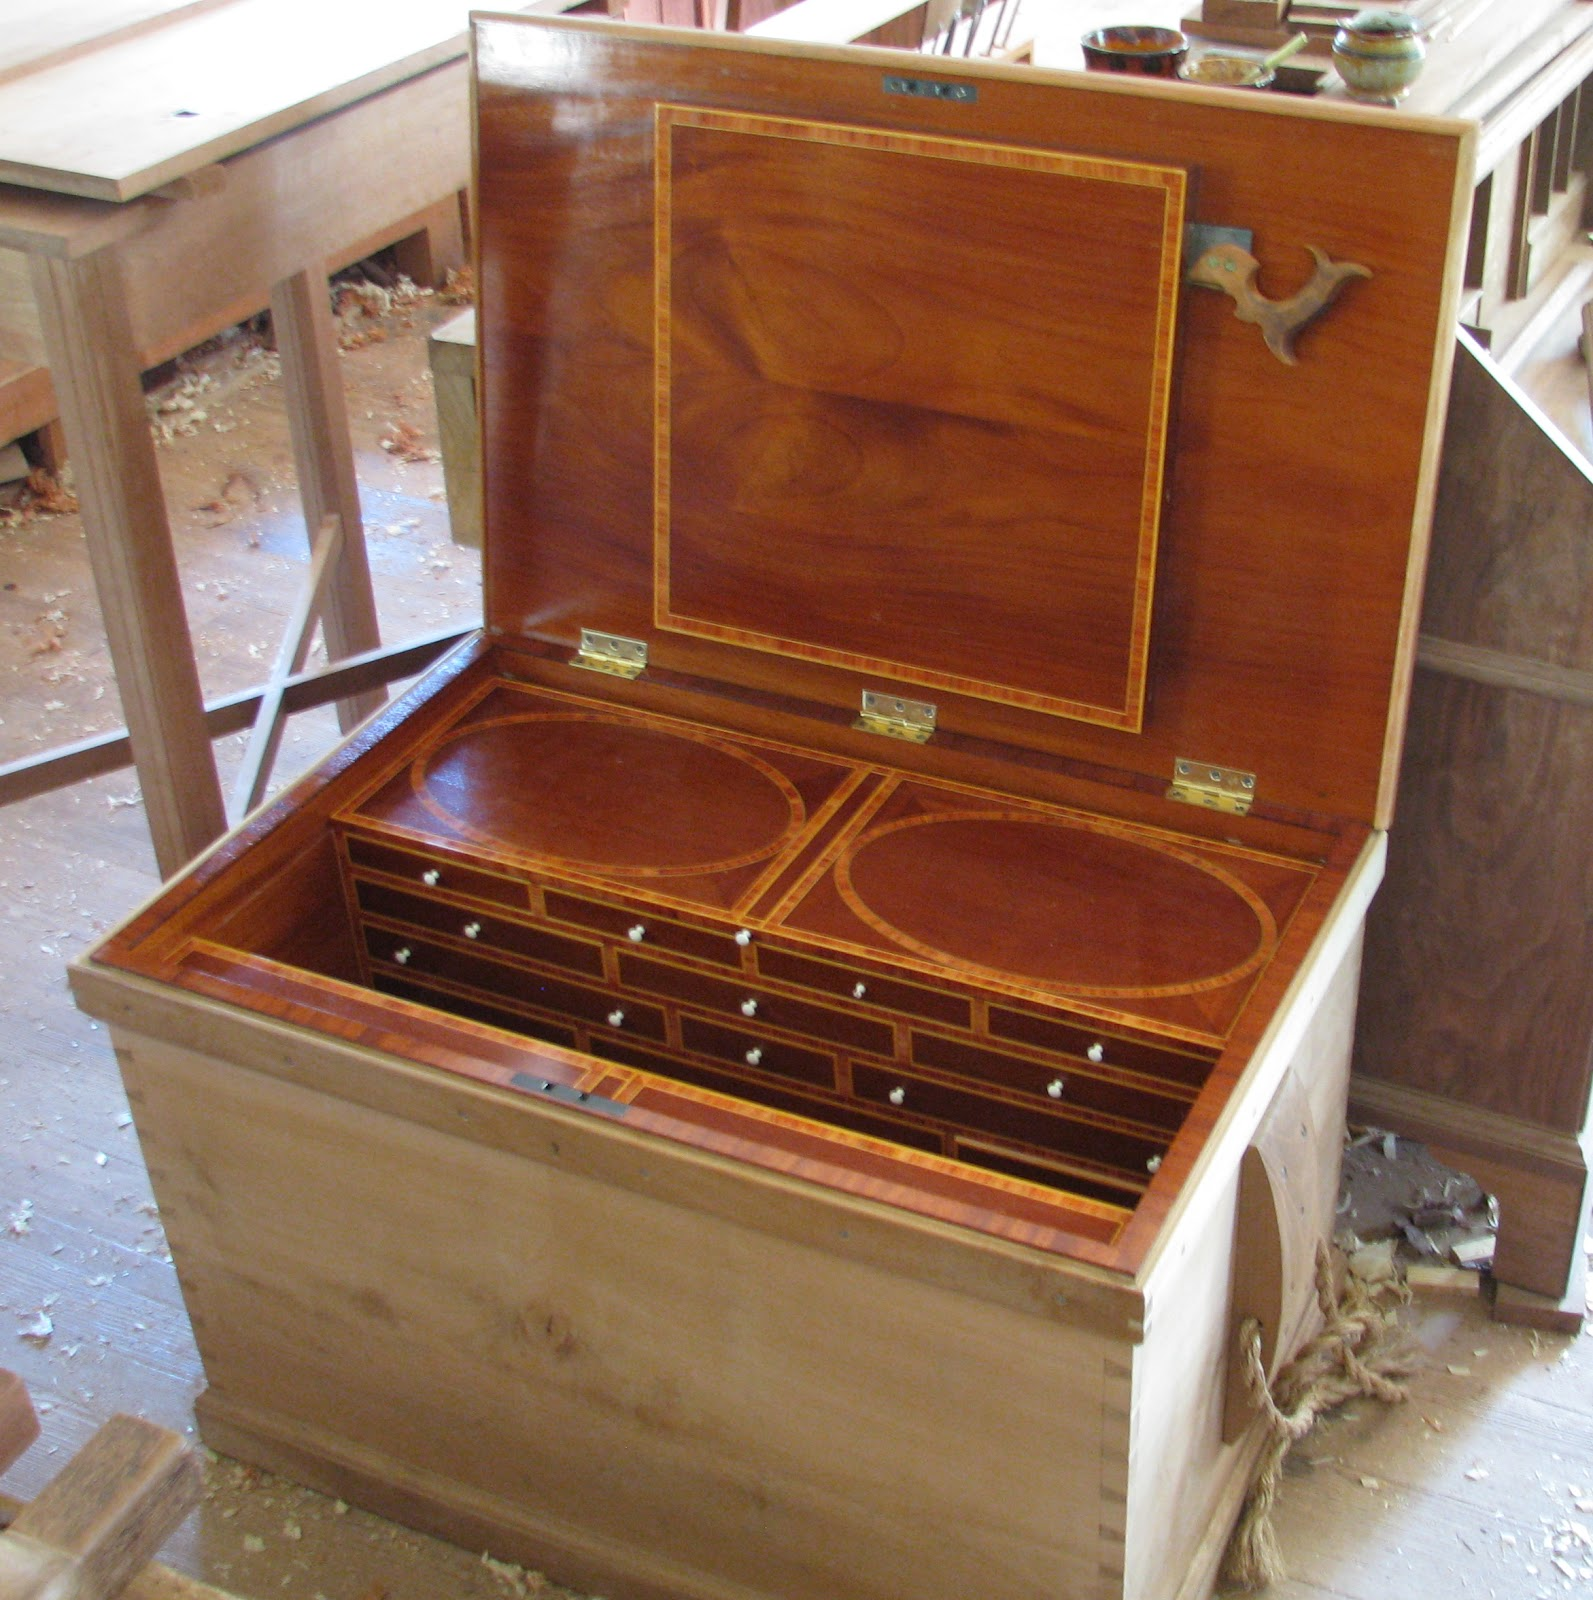 The Village Carpenter: Tool Chest of Benjamin Seaton